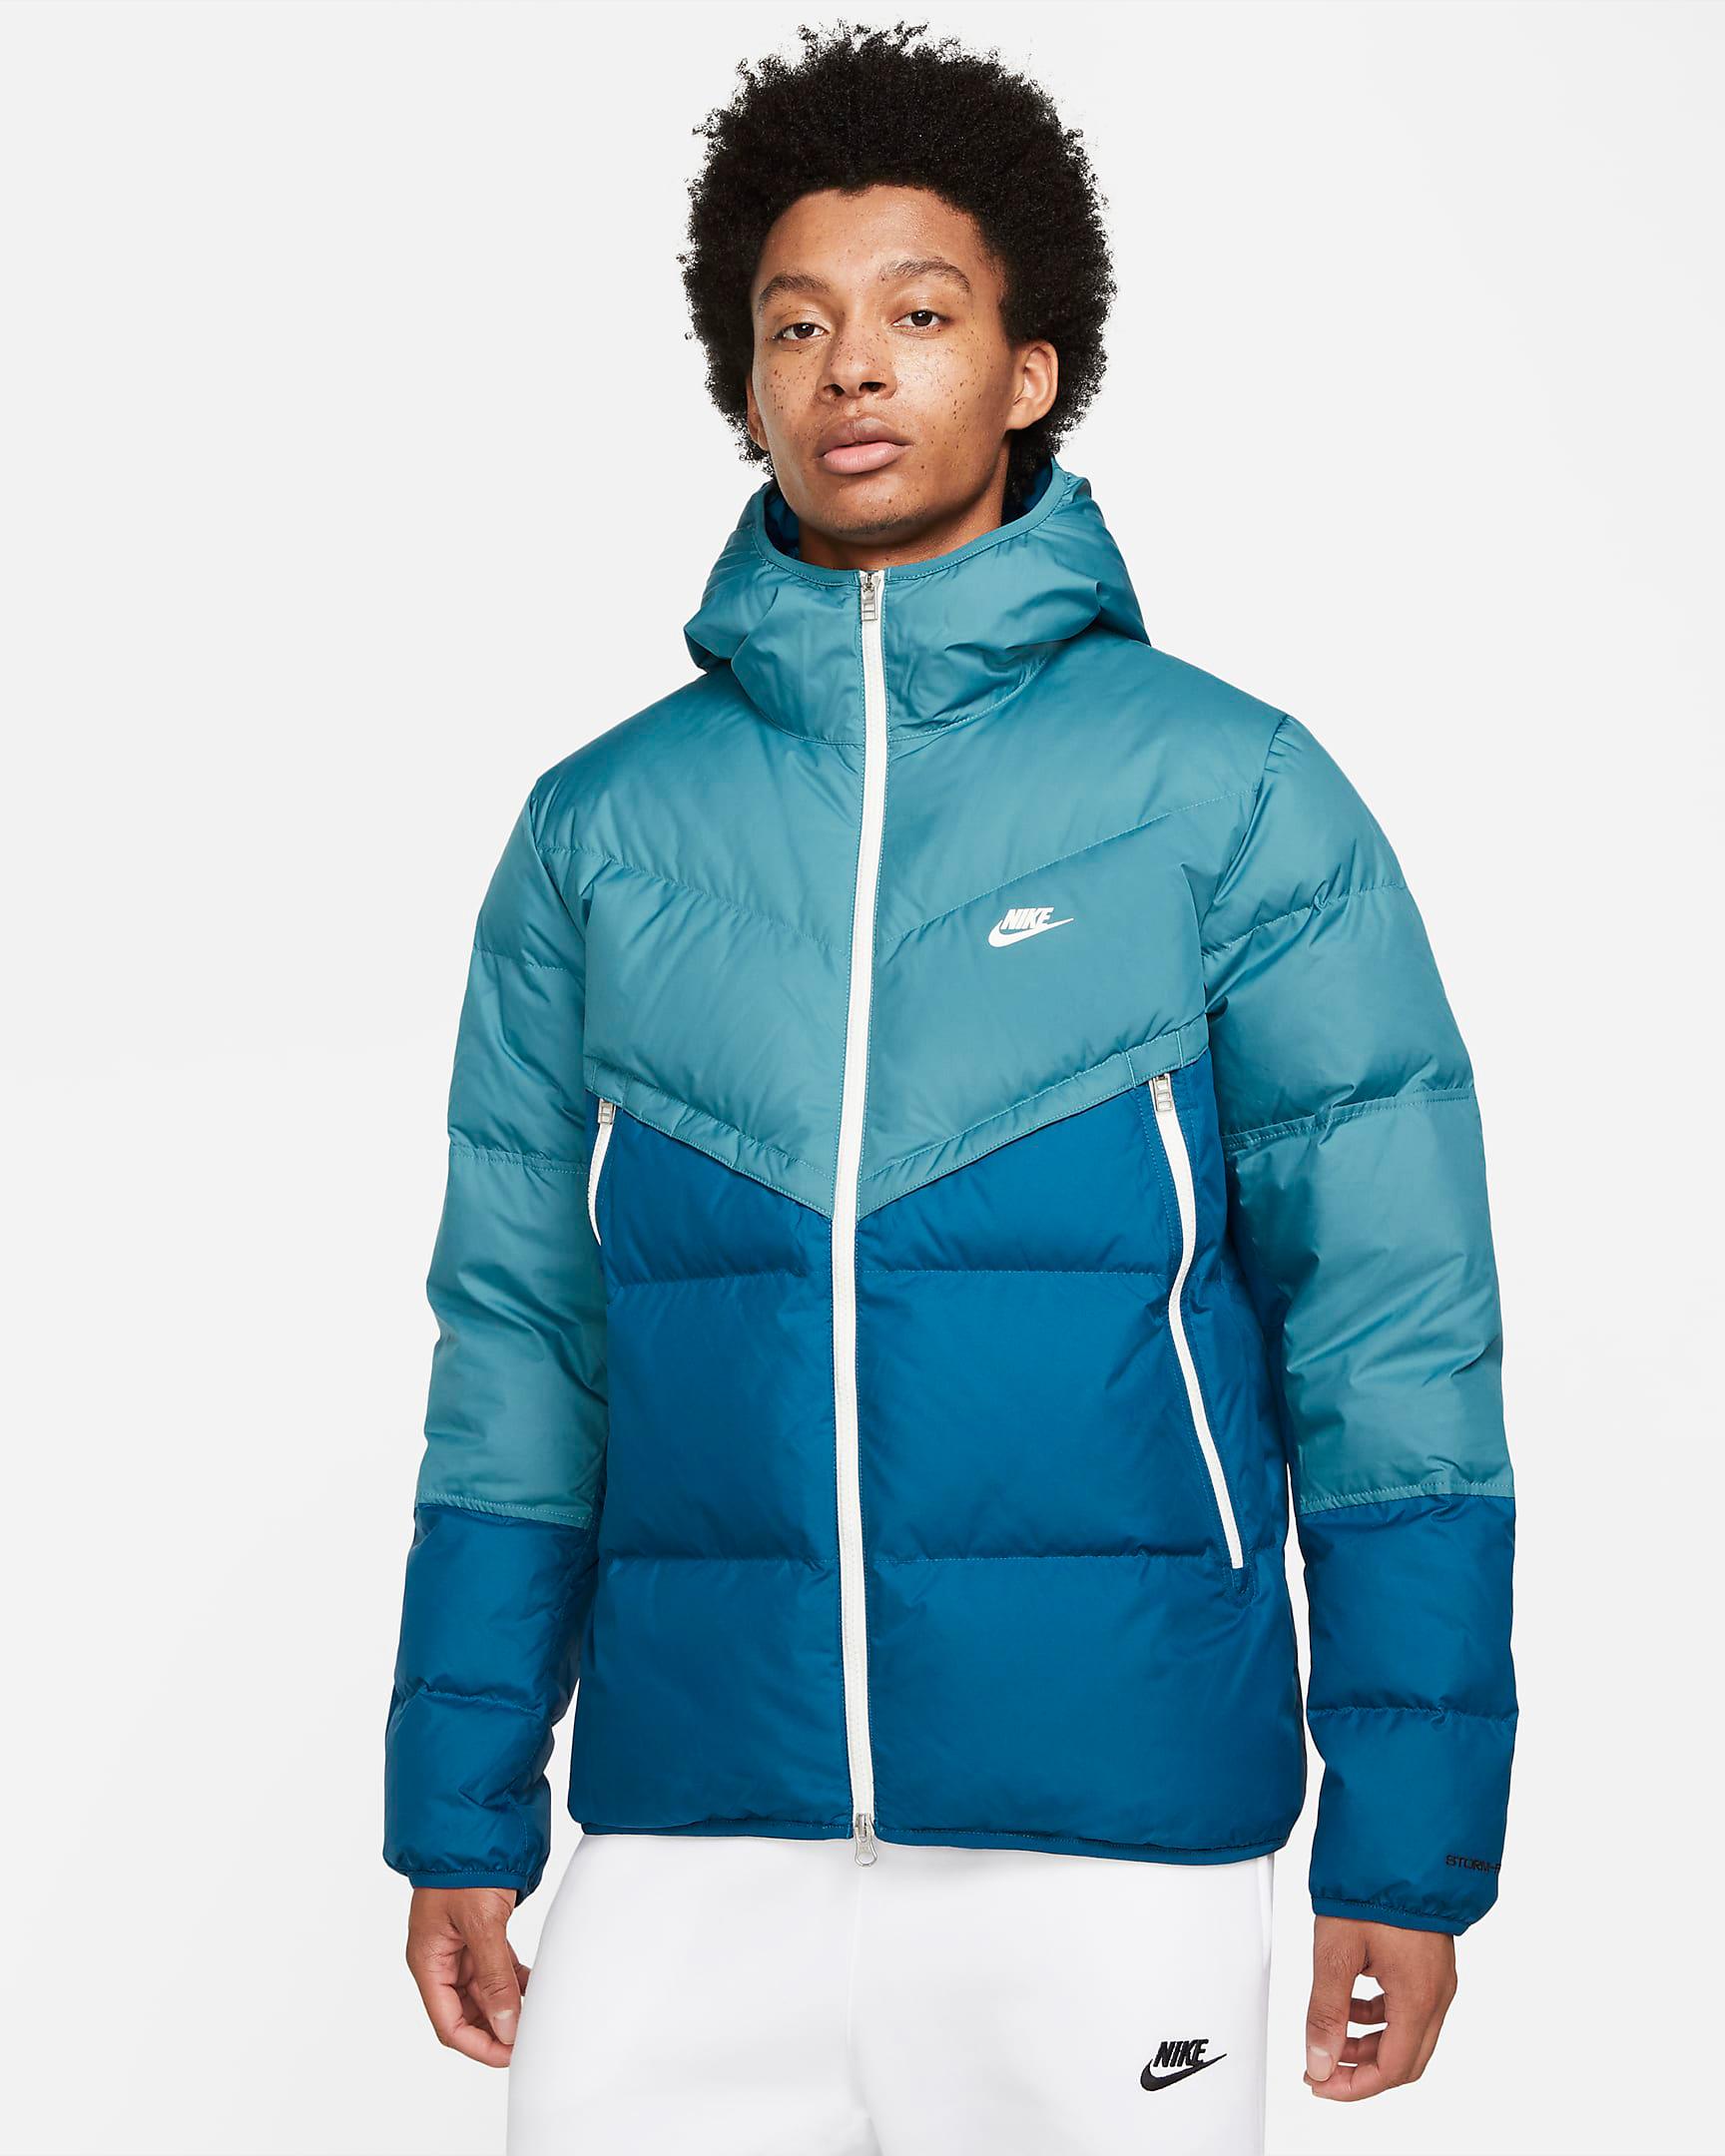 nike-sportswear-storm-fit-windrunner-jacket-rift-blue-court-blue-sail-1